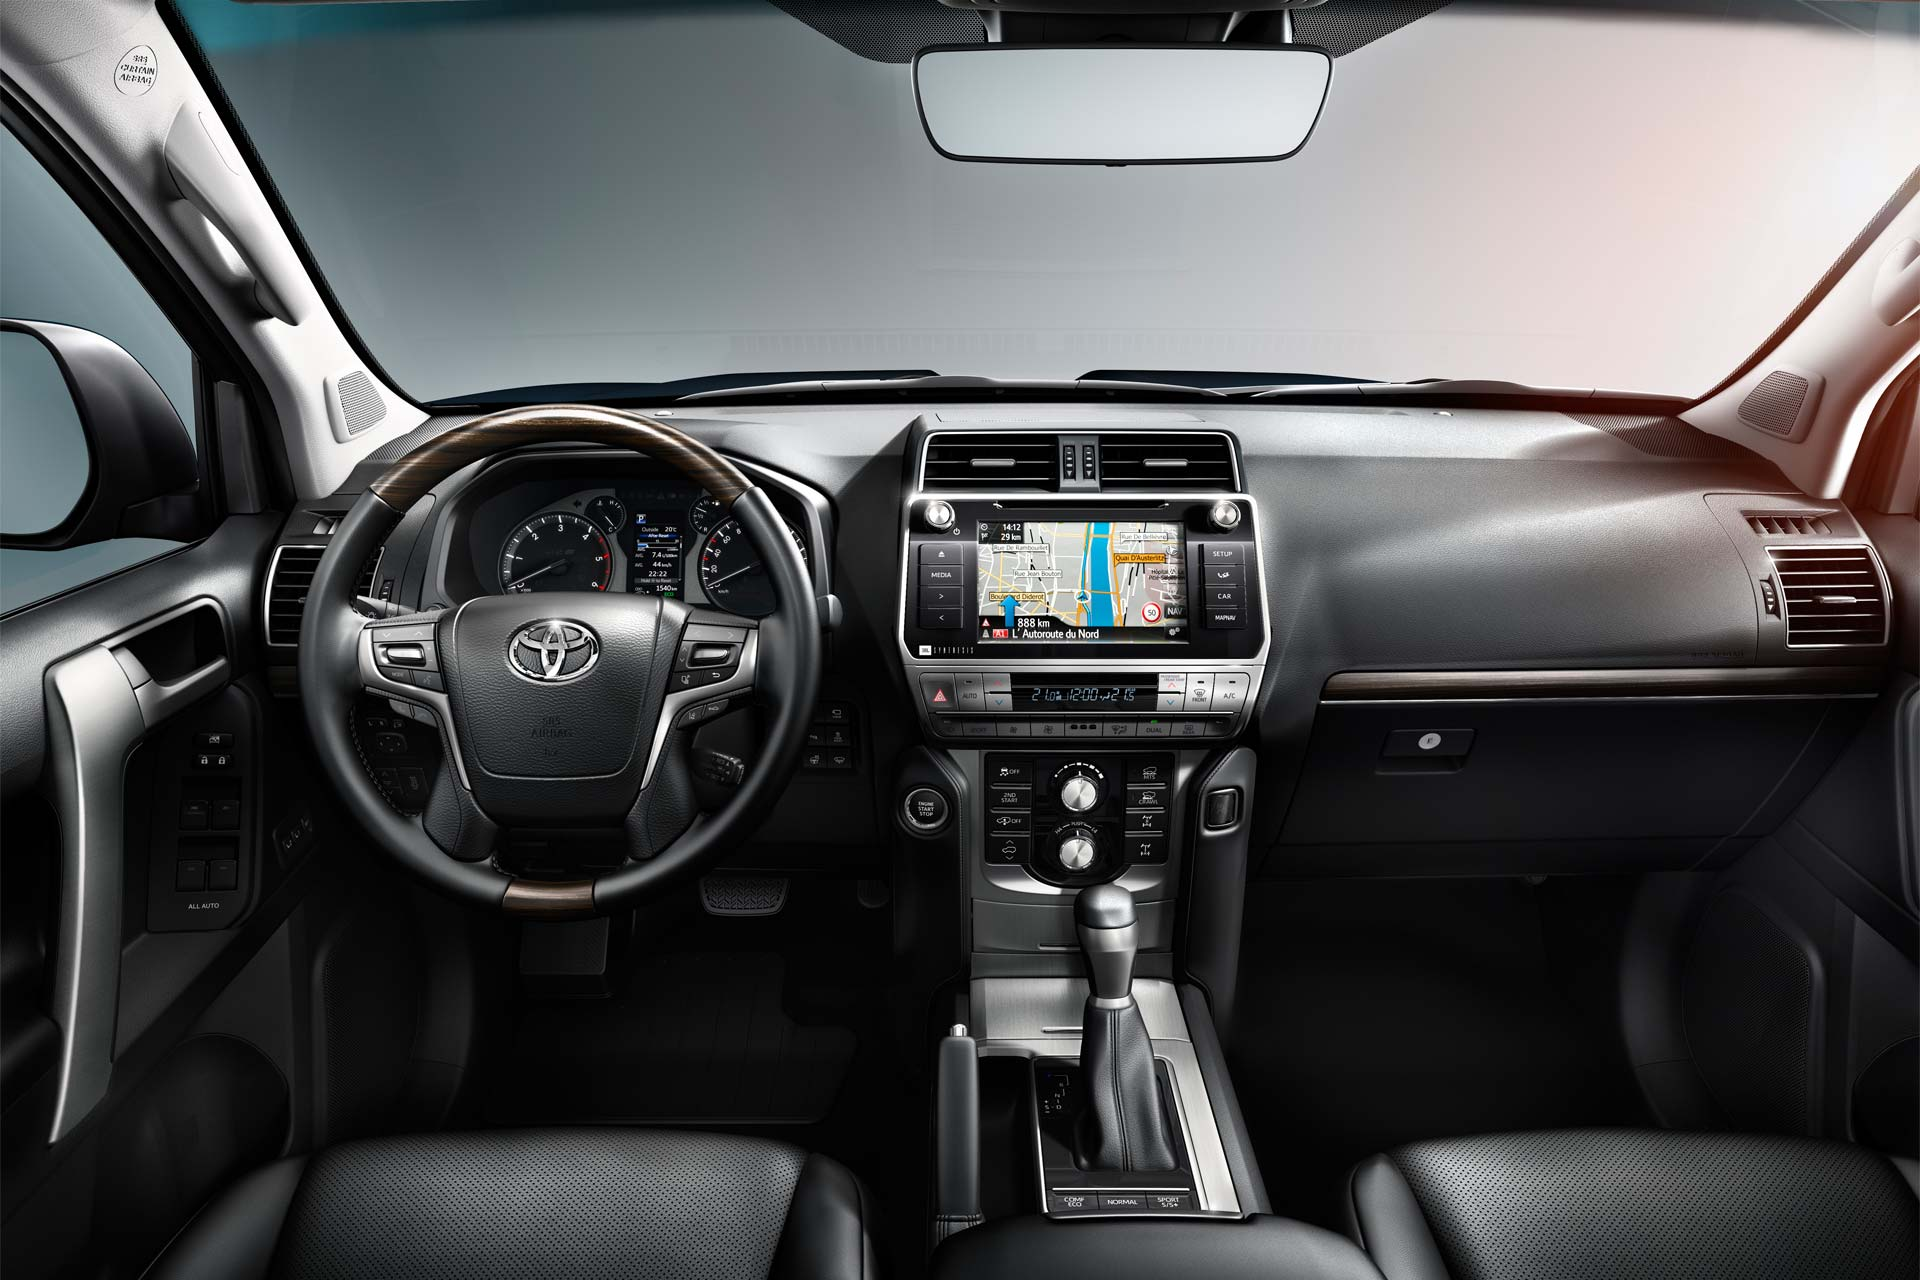 2018 Toyota Land Cruiser Prado Gets Enhanced On Board